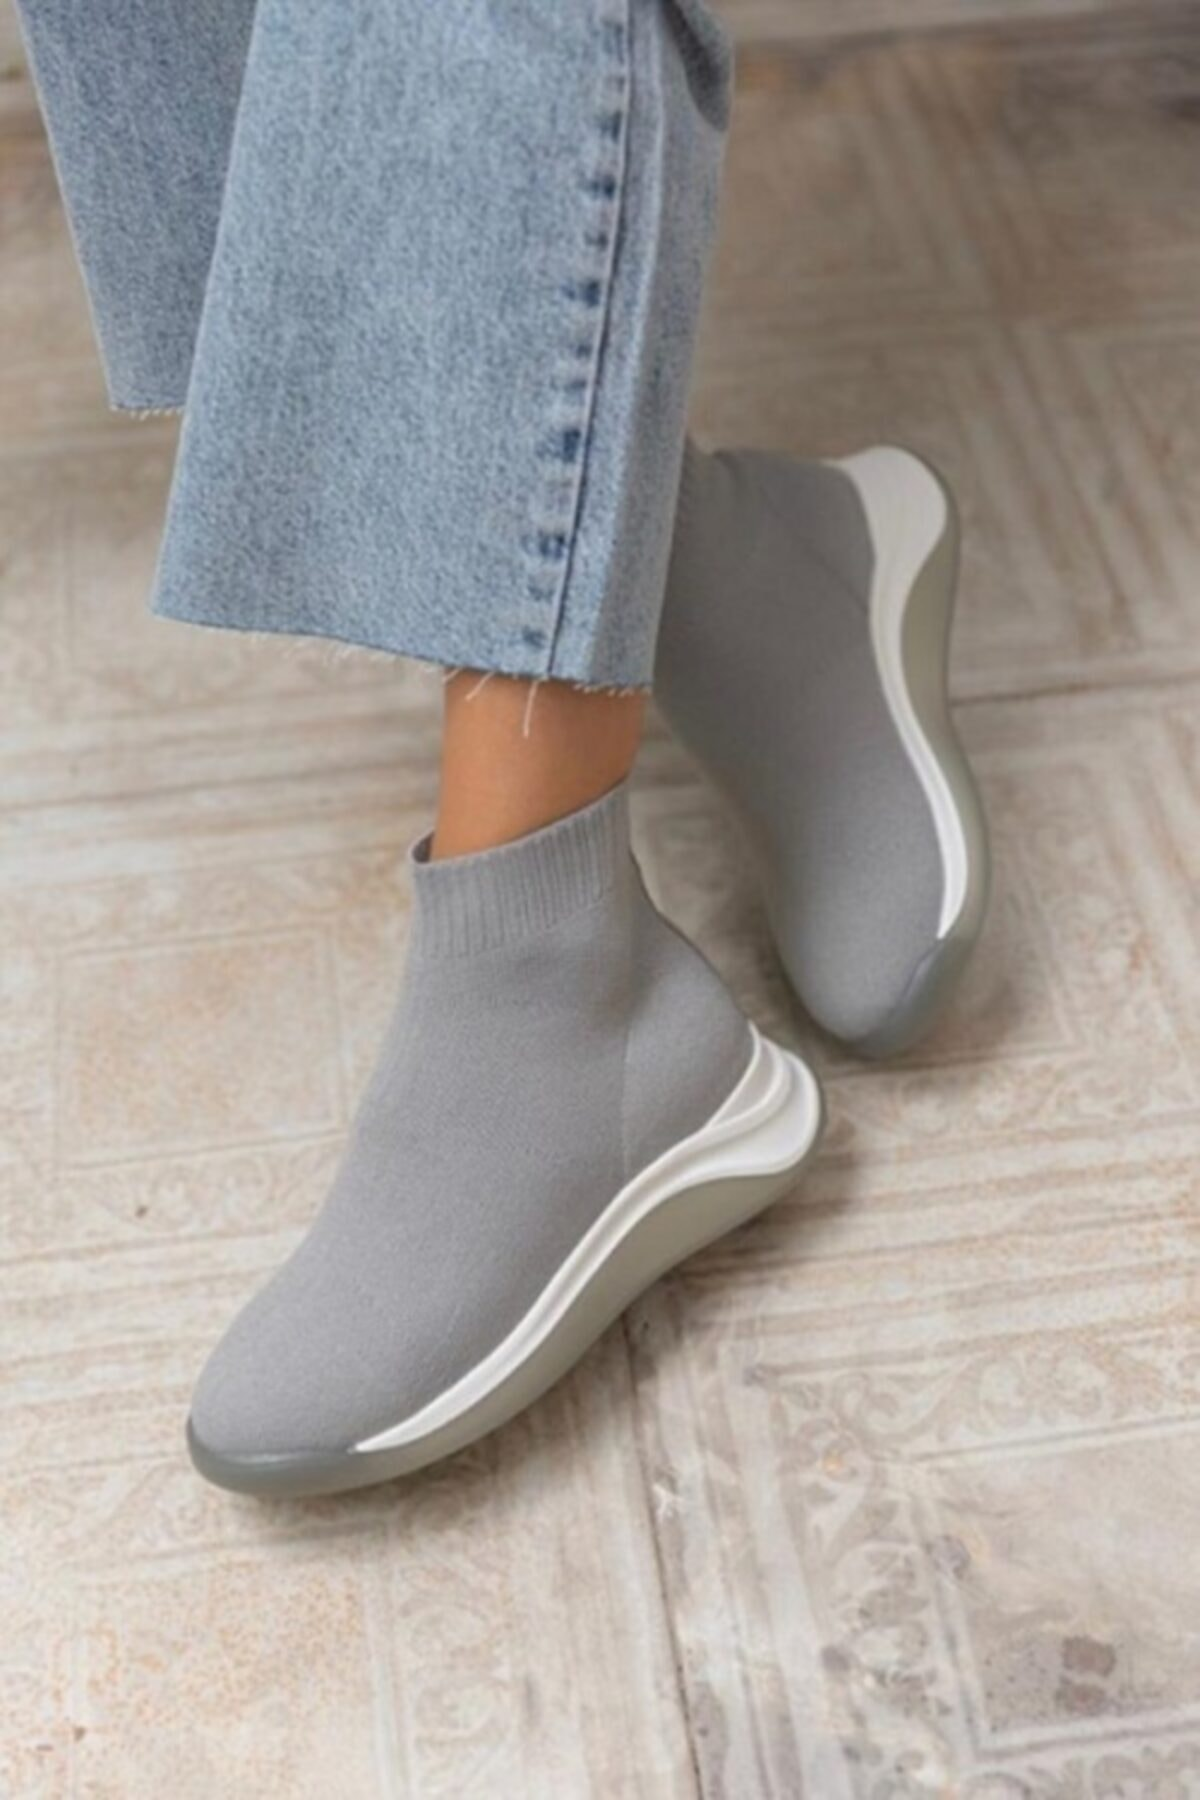 KİMİYA71 SHOES Kimiya71 Kadın Streç Triko Bot / Çorap Bot 1